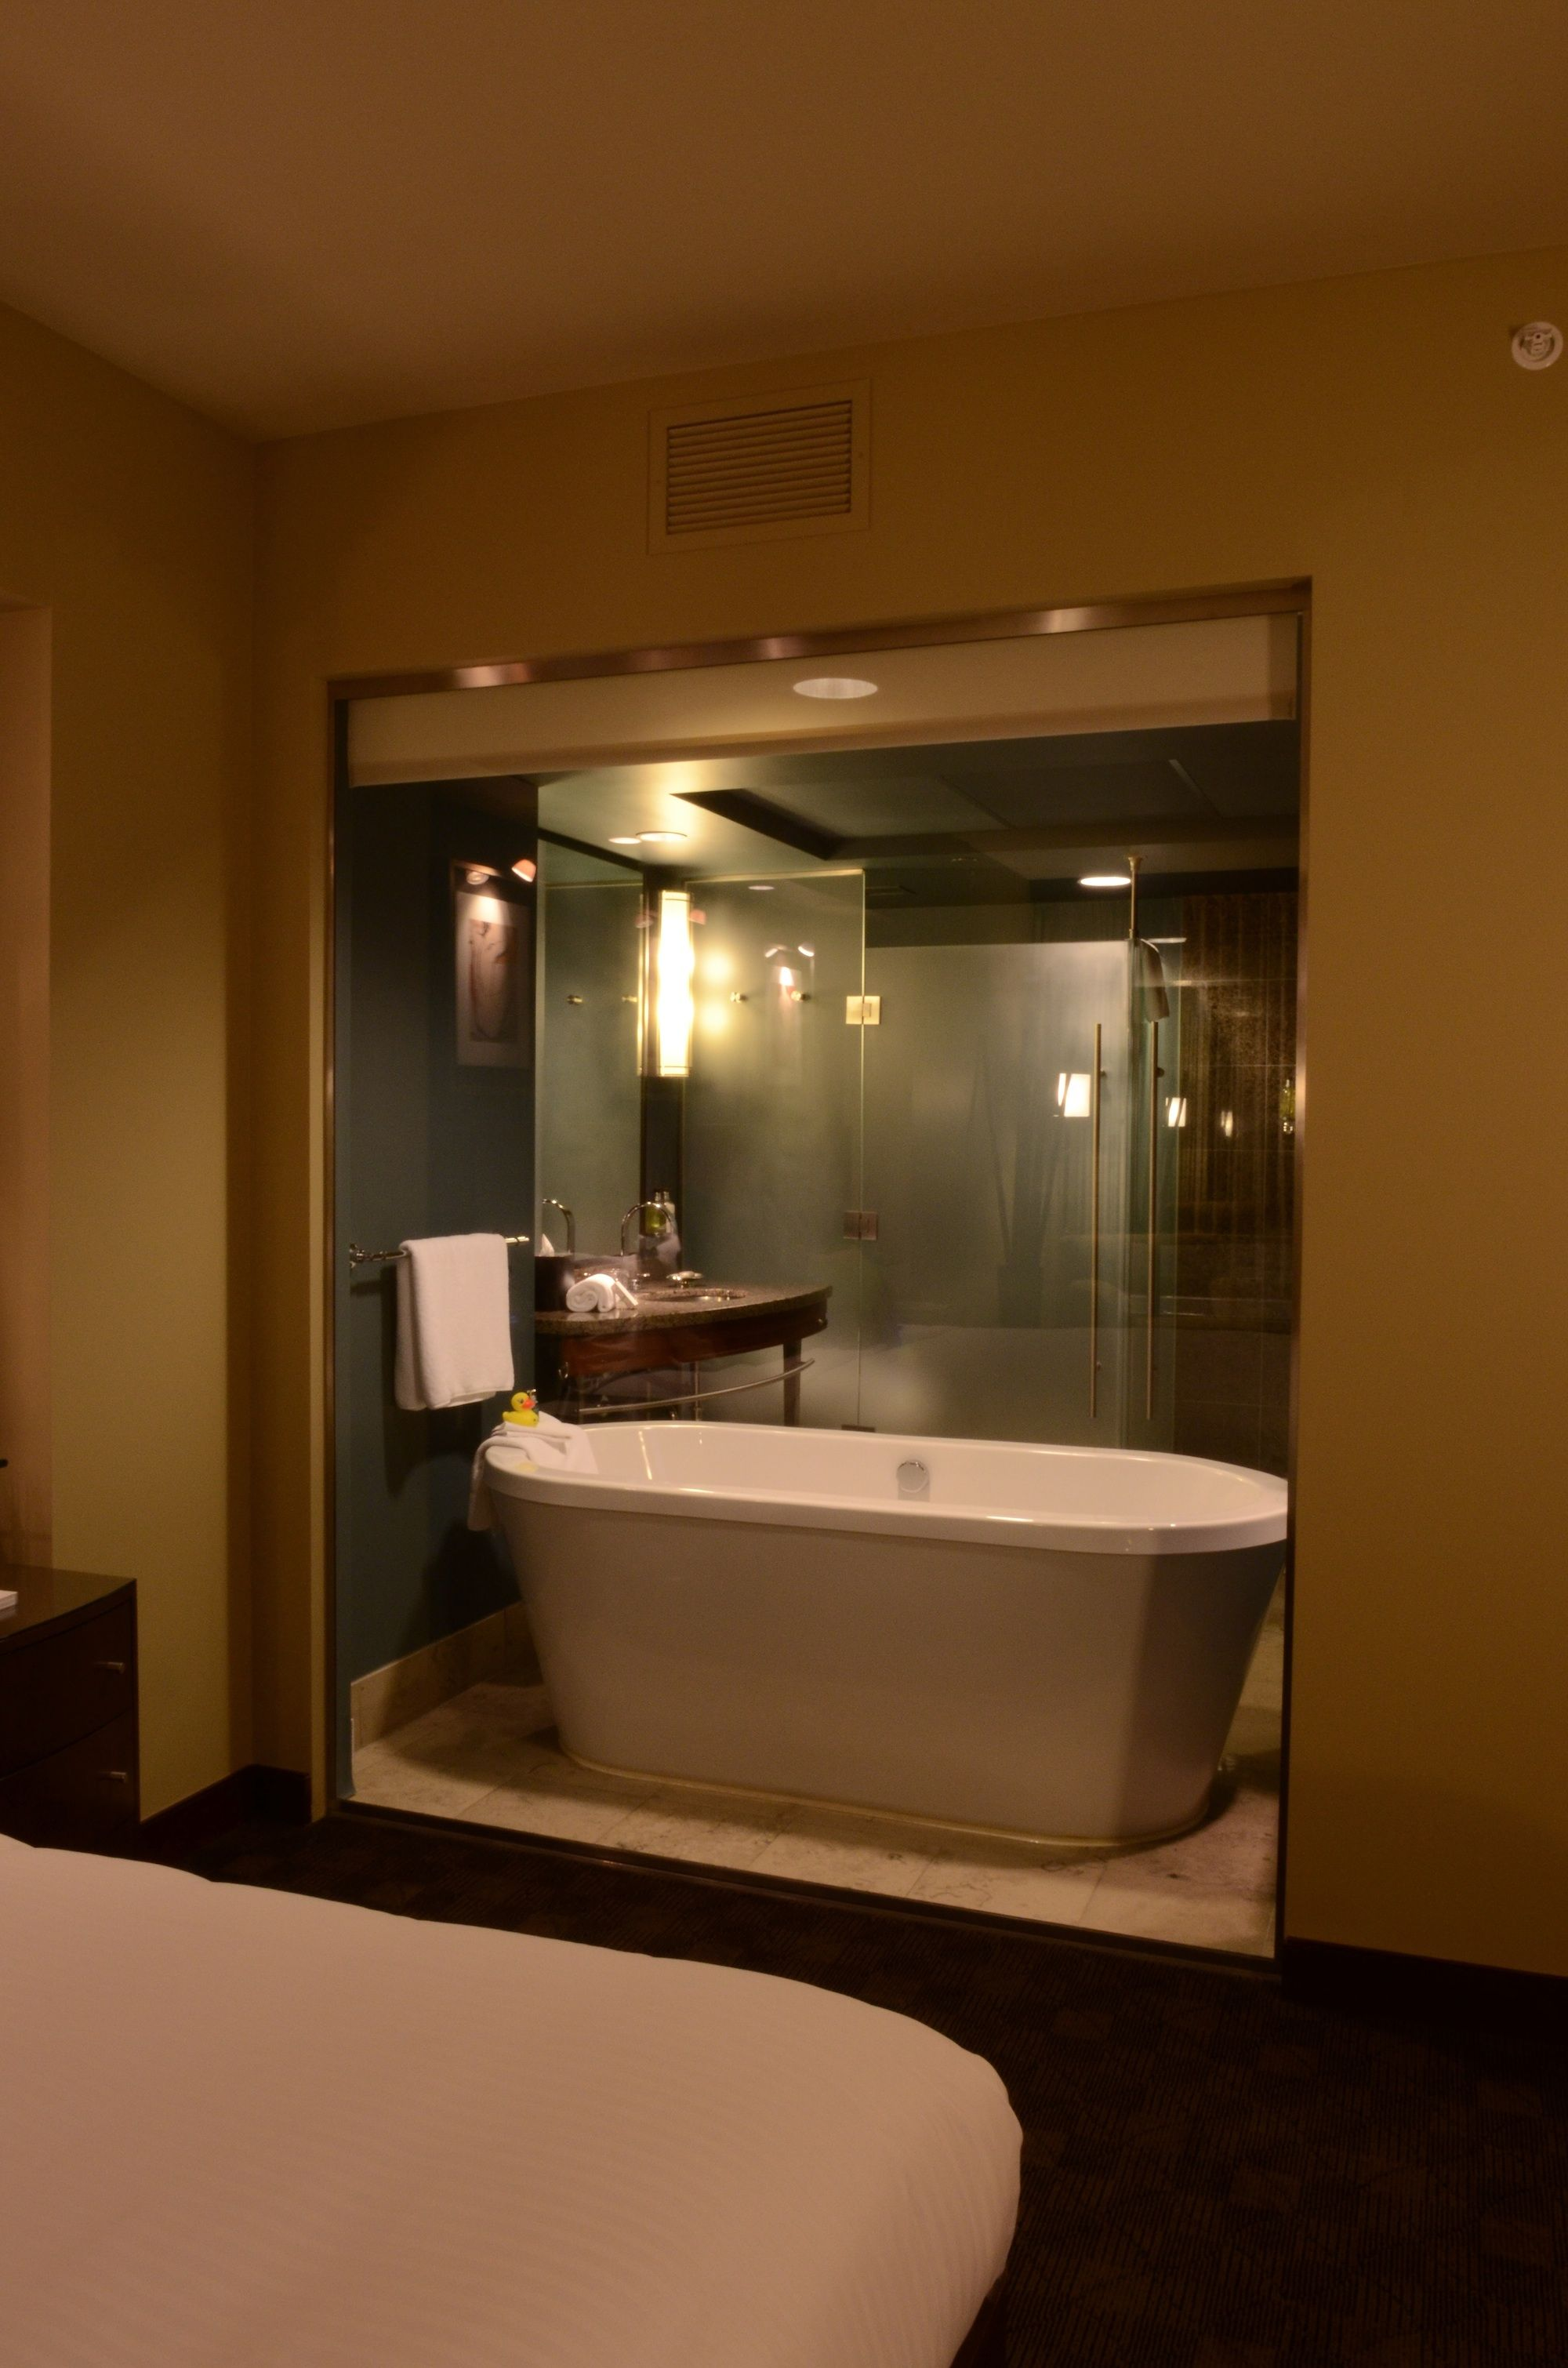 Free standing bath tub at Hotel 1000 #tub #hotel #travel | Inside ...